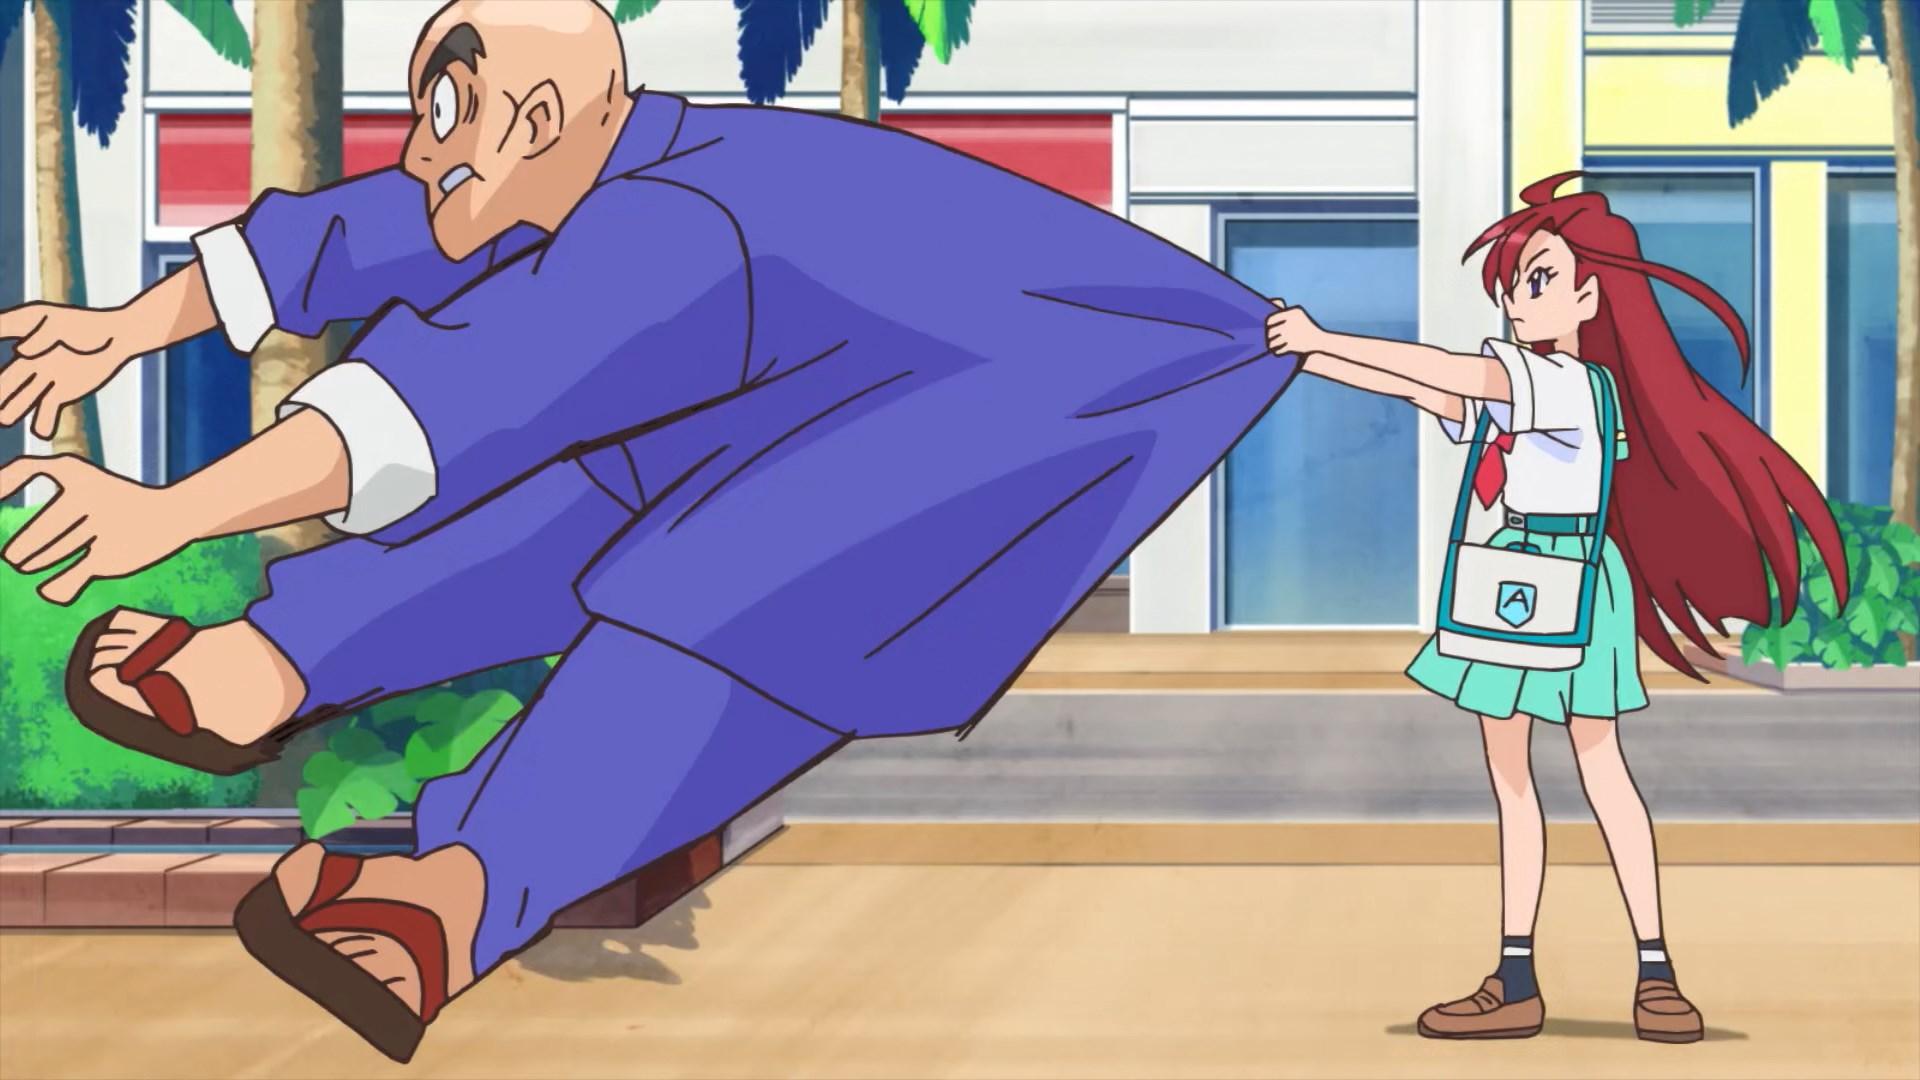 Asuka easily throws bully